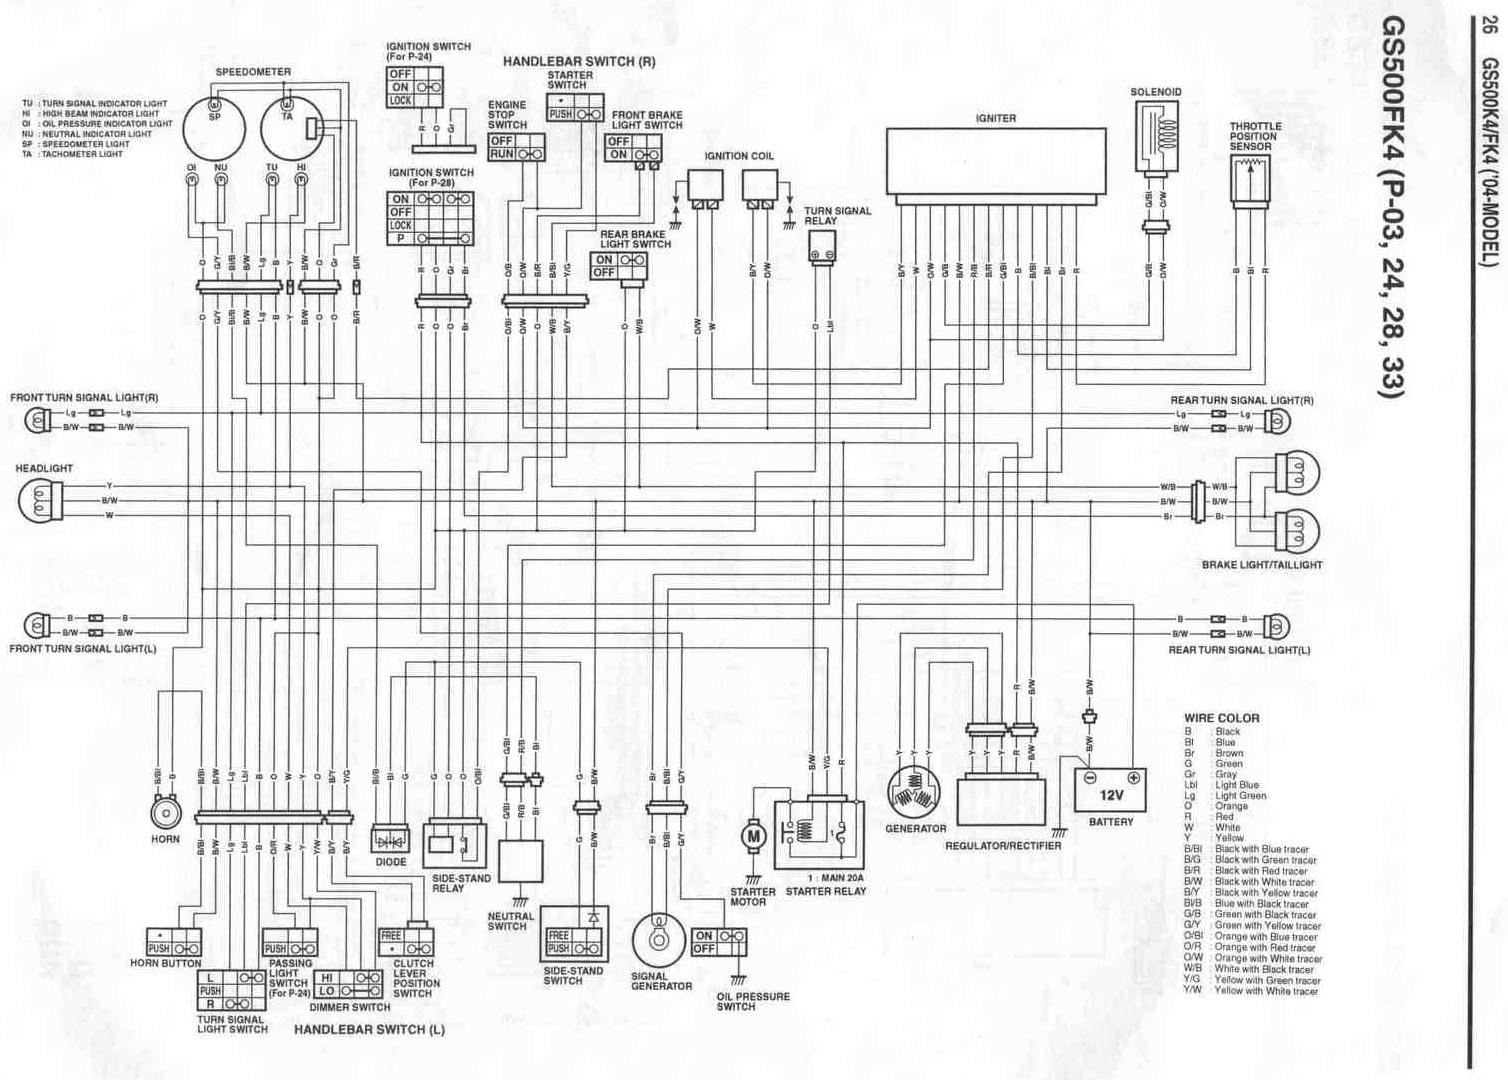 Remarkable Suzuki Ltz 250 Wiring Diagram Basic Electronics Wiring Diagram Wiring Cloud Itislusmarecoveryedborg